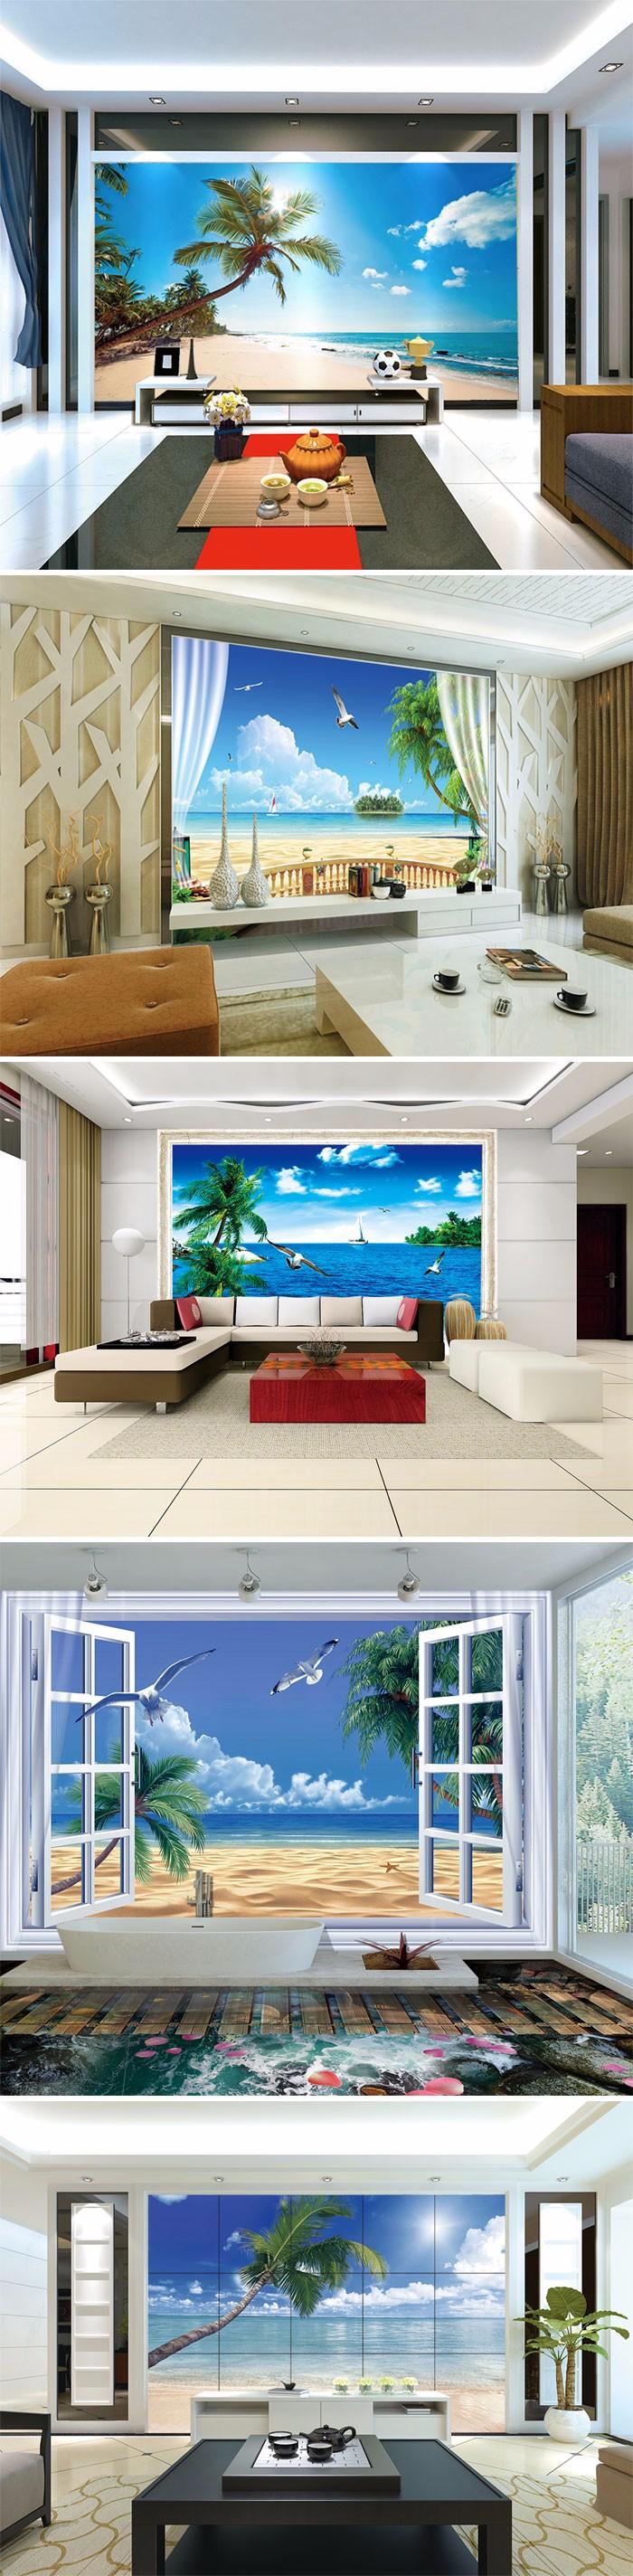 Hs3109 foshan royal decor ctm wall tilesbedroom decorative wall hs3109 foshan royal decor ctm wall tilesbedroom decorative wall tiles 200 x 300mm dailygadgetfo Images